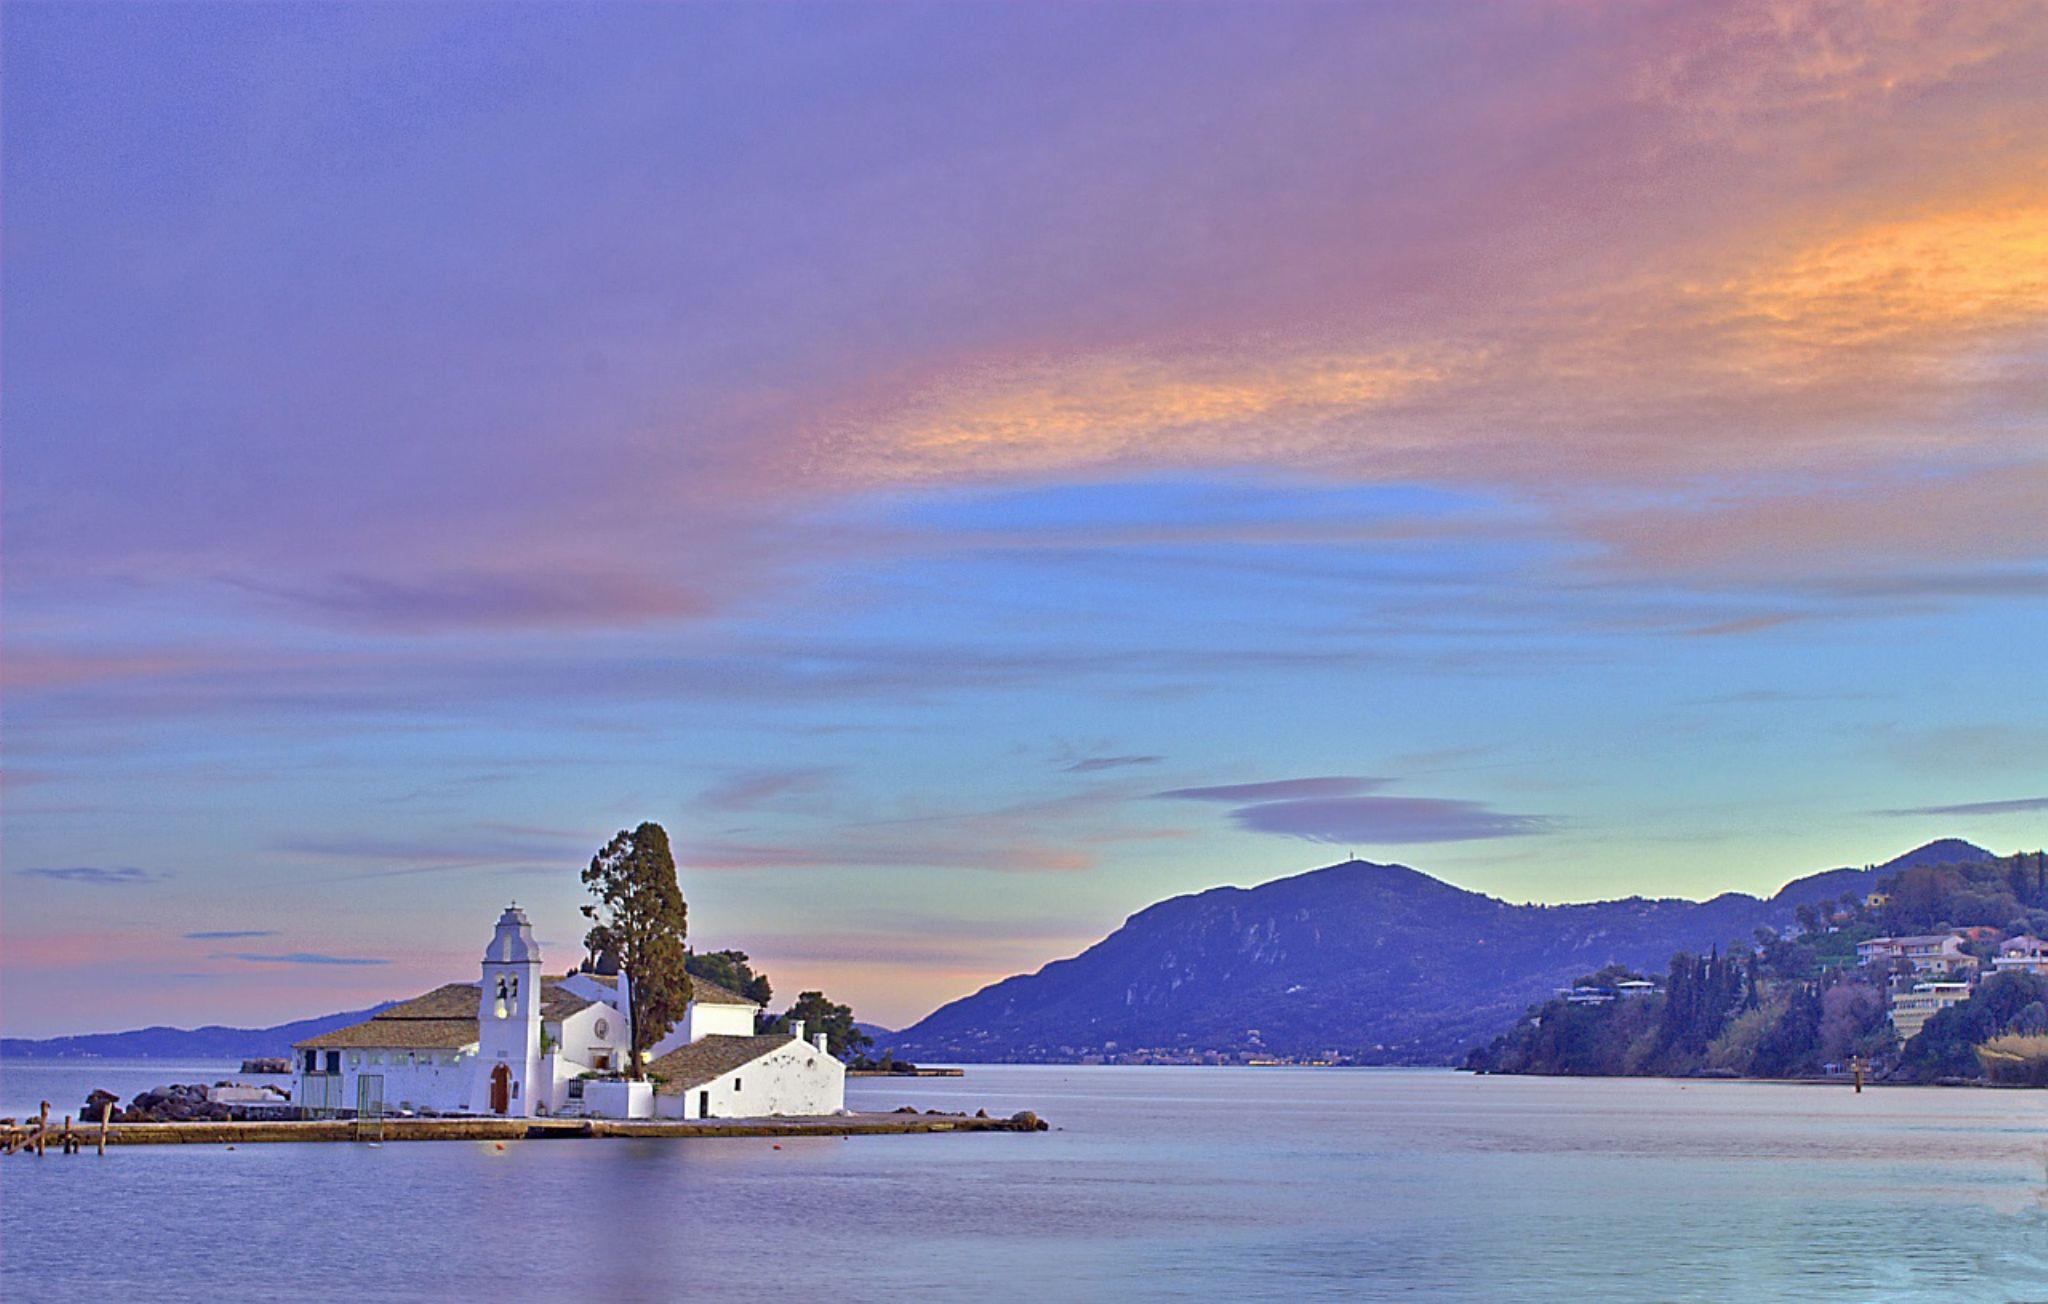 Corfu Island, Greece by kasiospaul